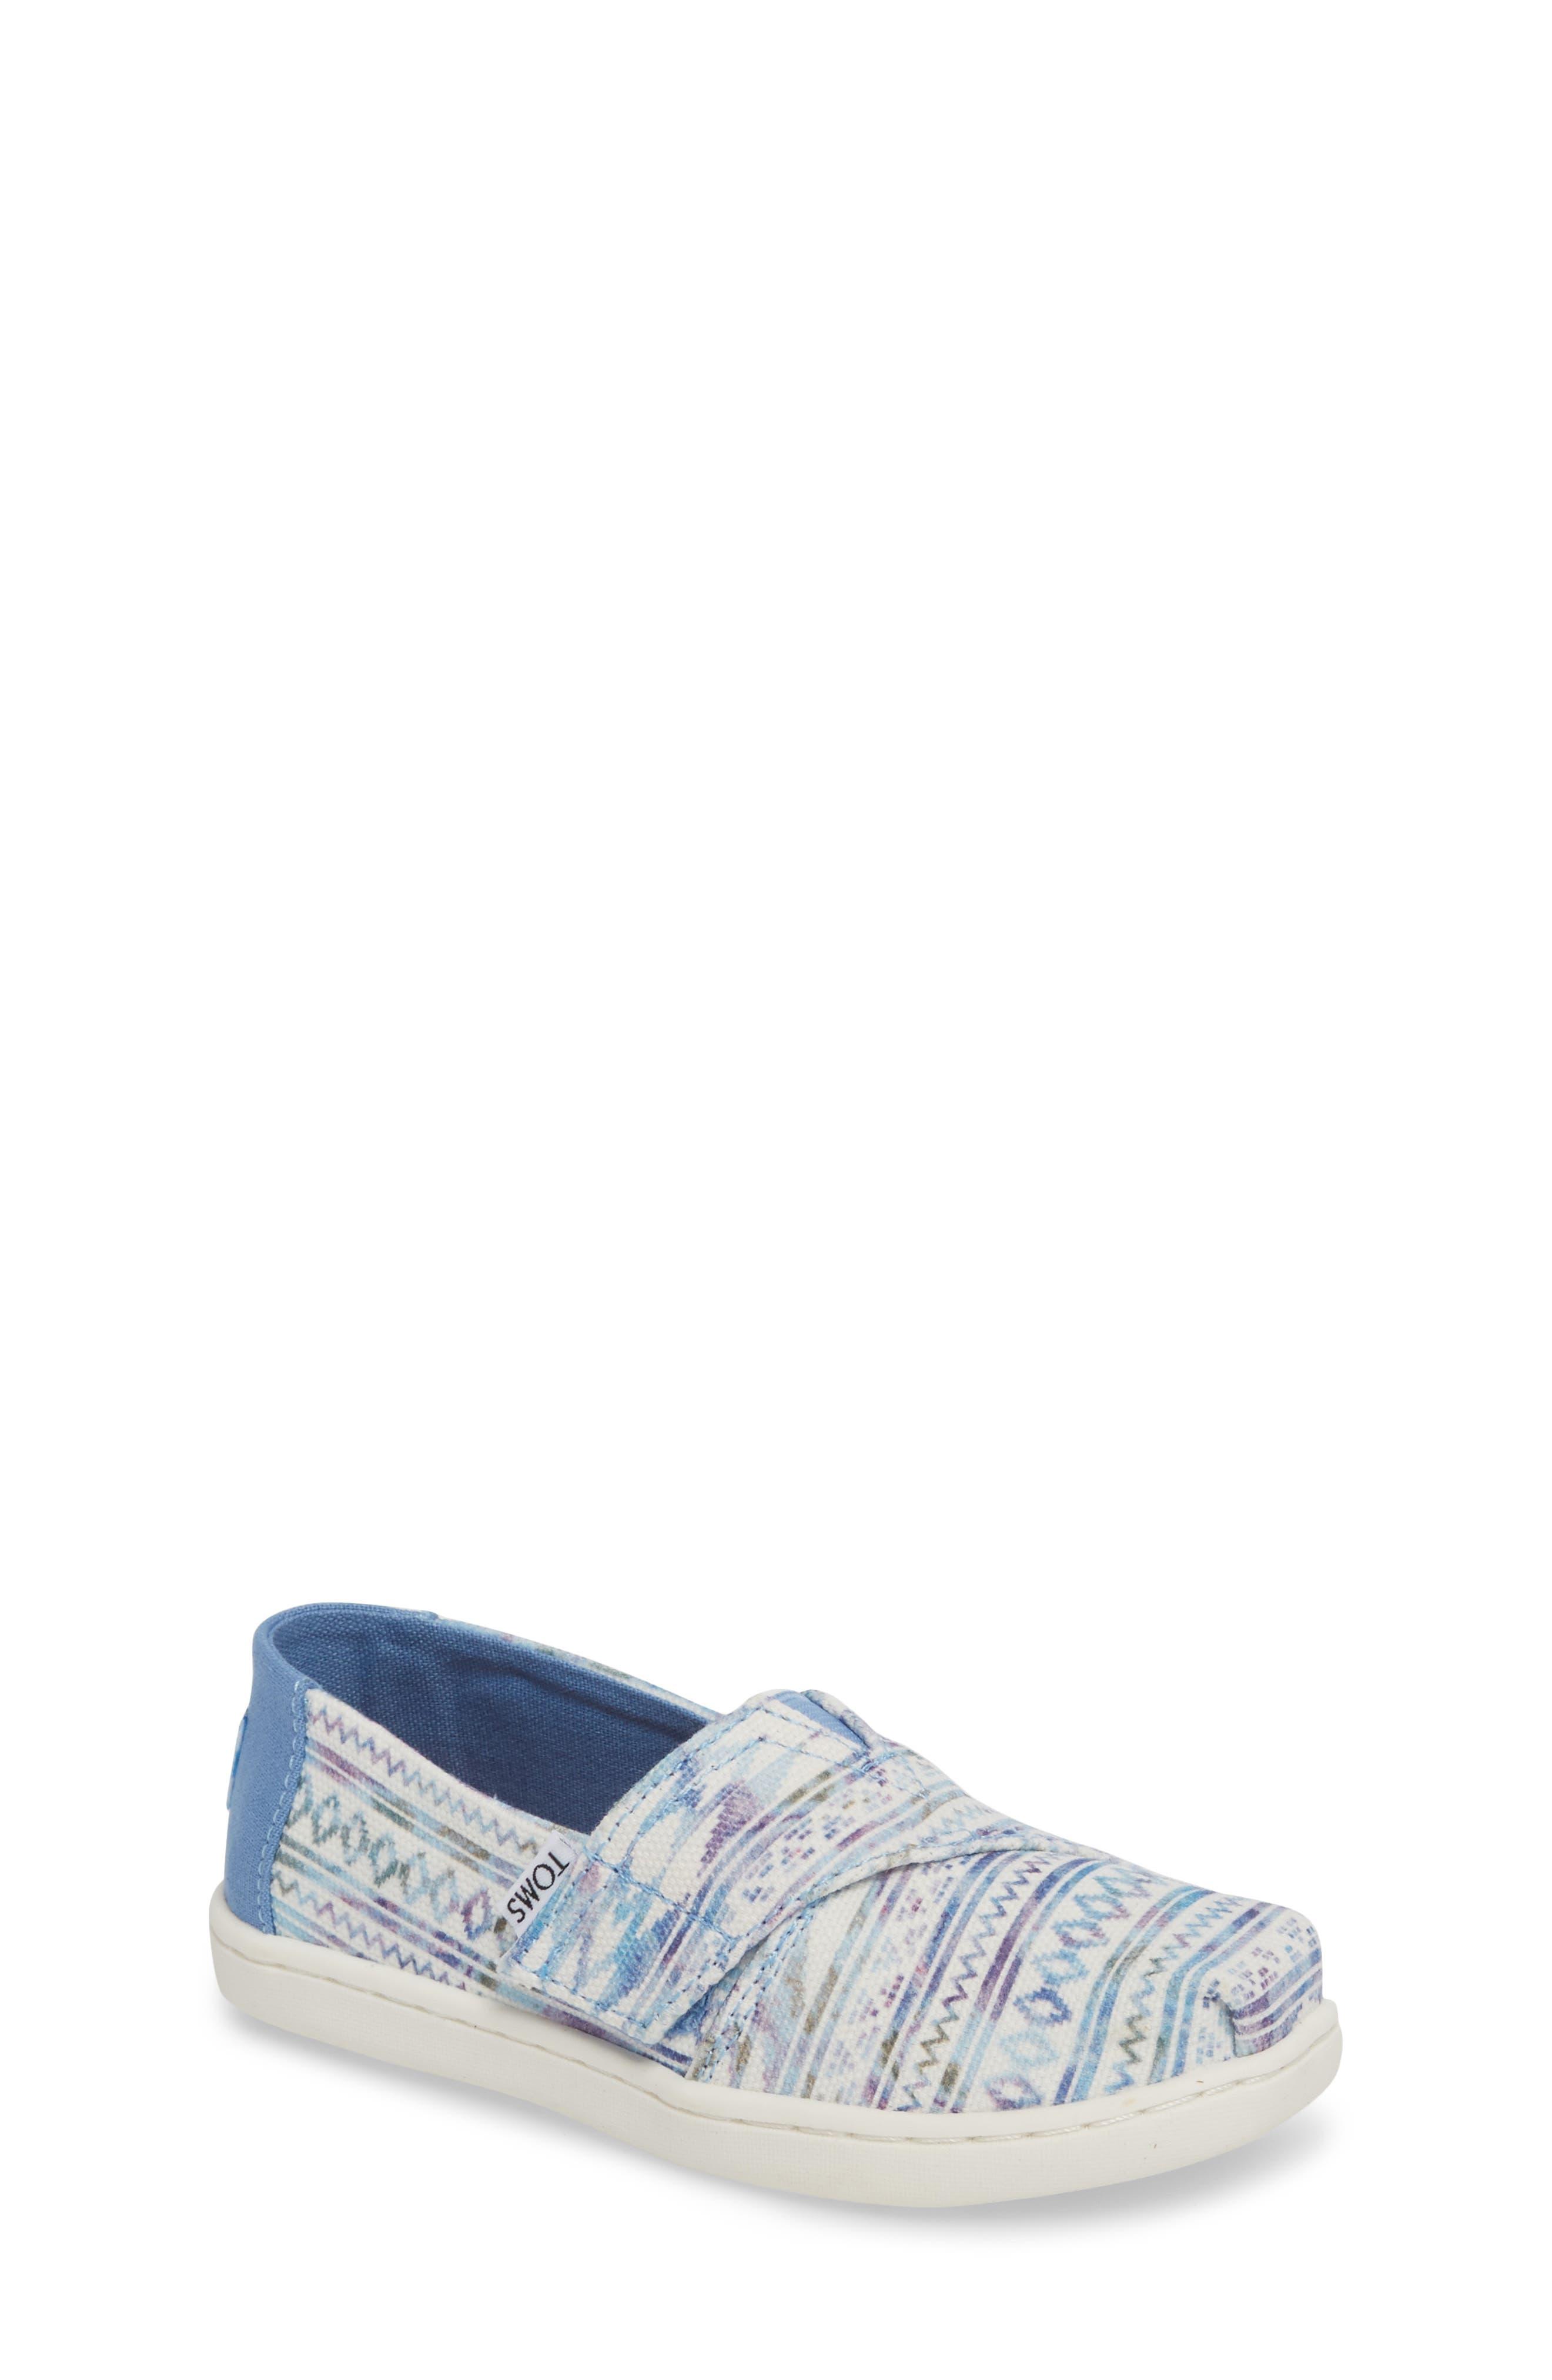 5b9a77ffa08 Kids  TOMS For Walker Girls (12-24 Months) Shoes